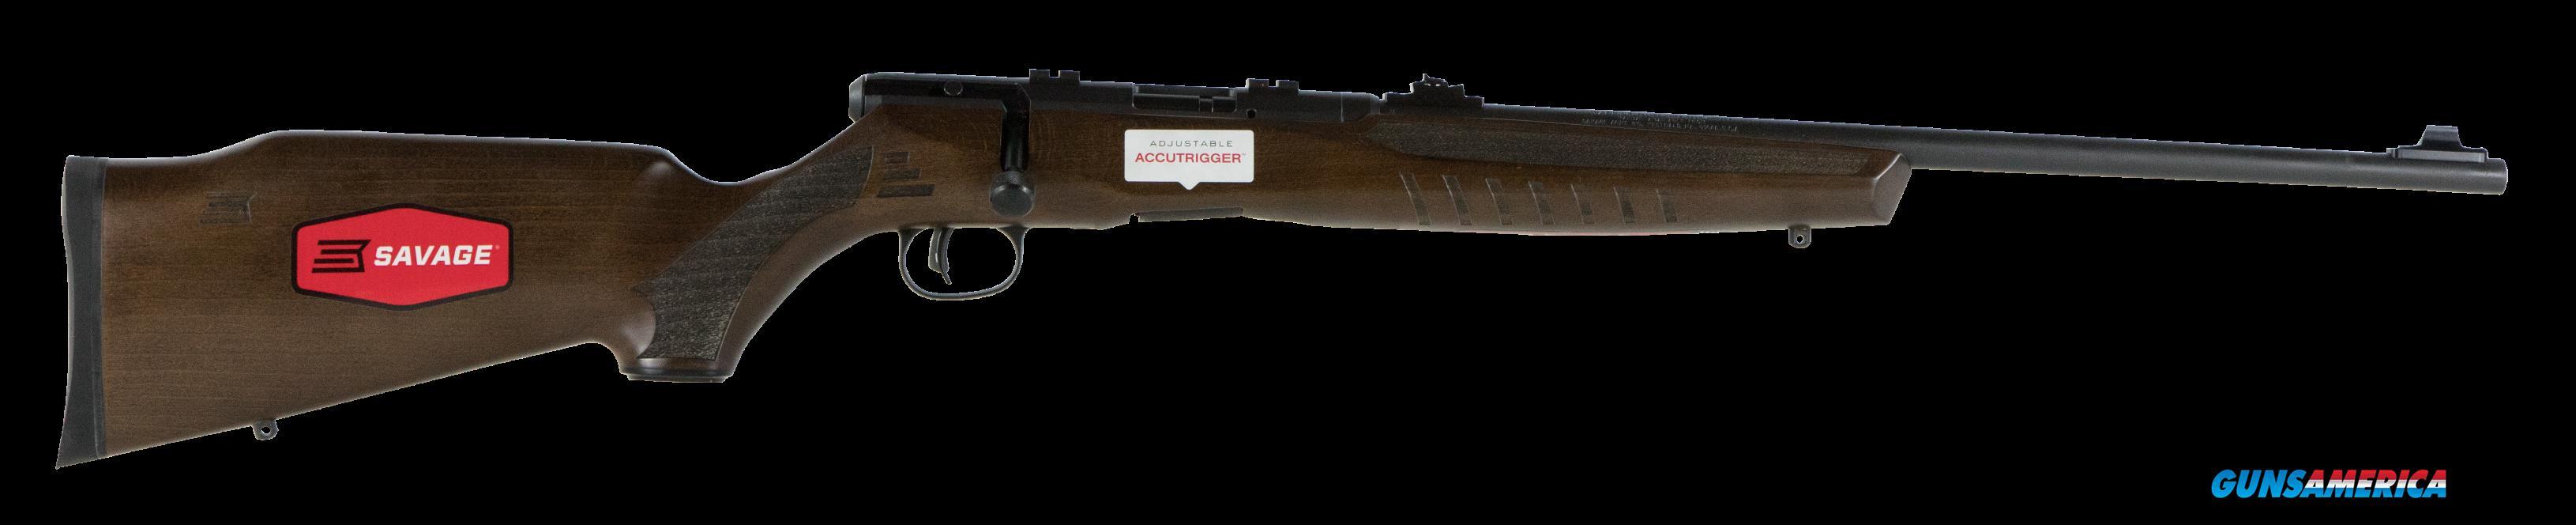 Savage B22, Sav 70210 B22g          22lr Bolt  Guns > Pistols > 1911 Pistol Copies (non-Colt)